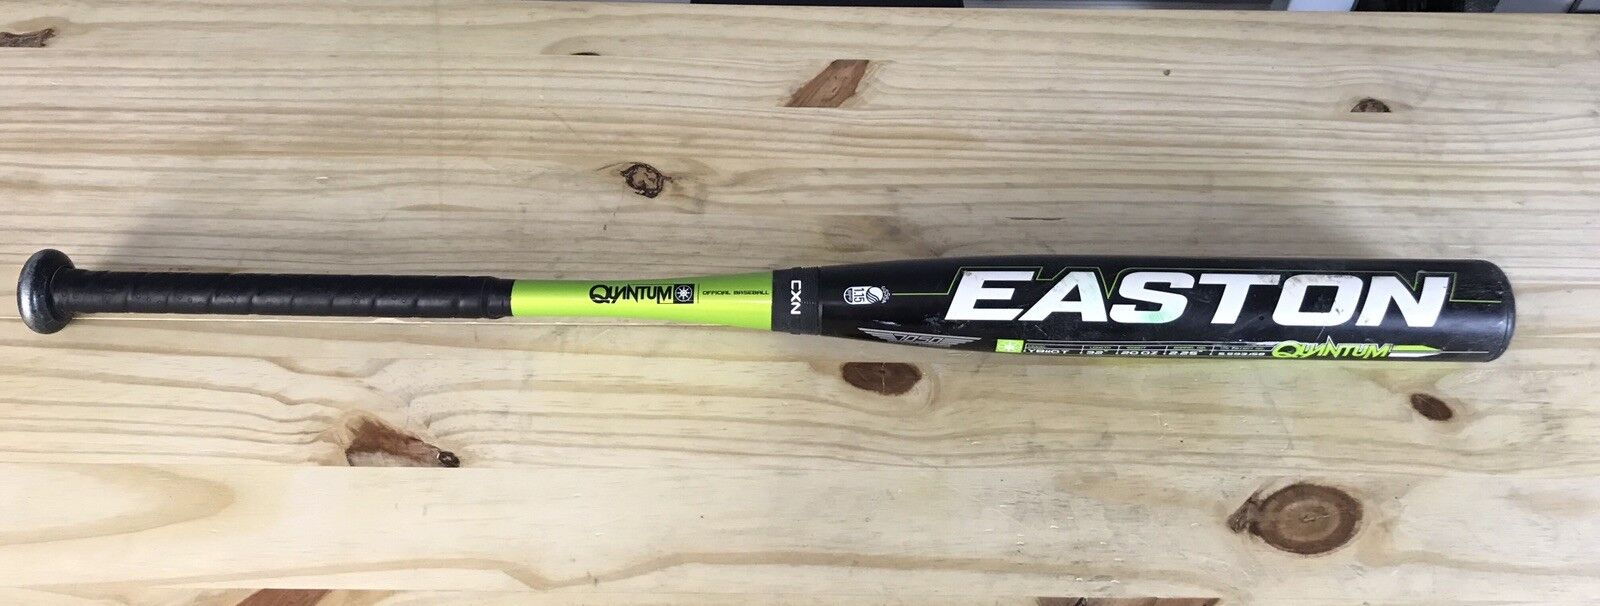 Easton 32 20 Quantum Youth Little League Baseball Bat YB11QT Great Condition